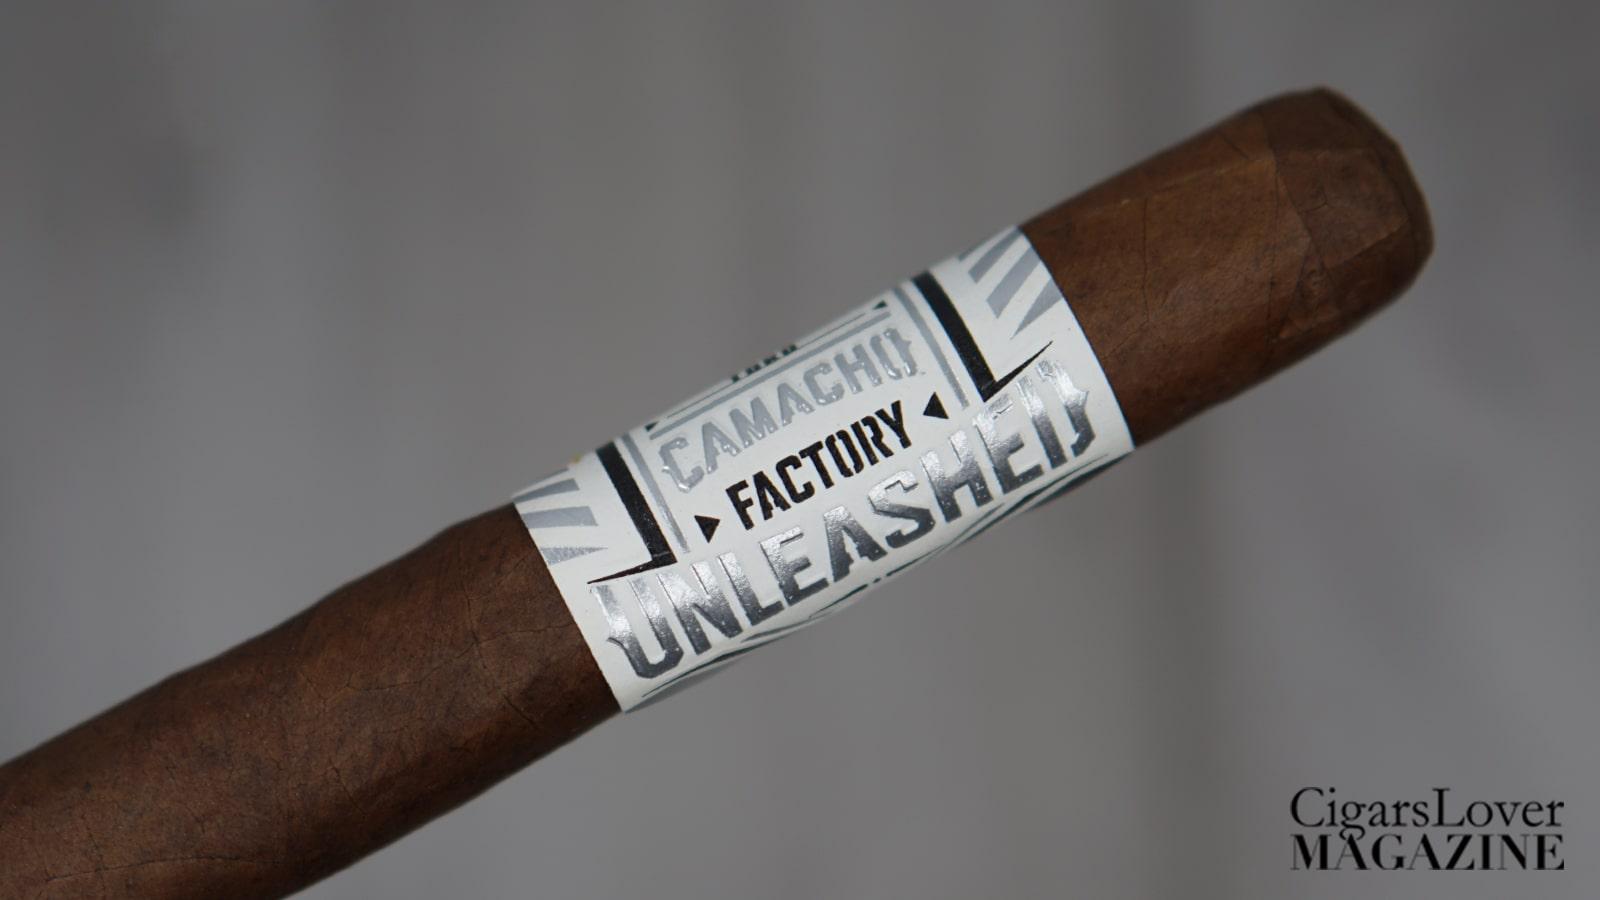 Camacho Factory Unleashed